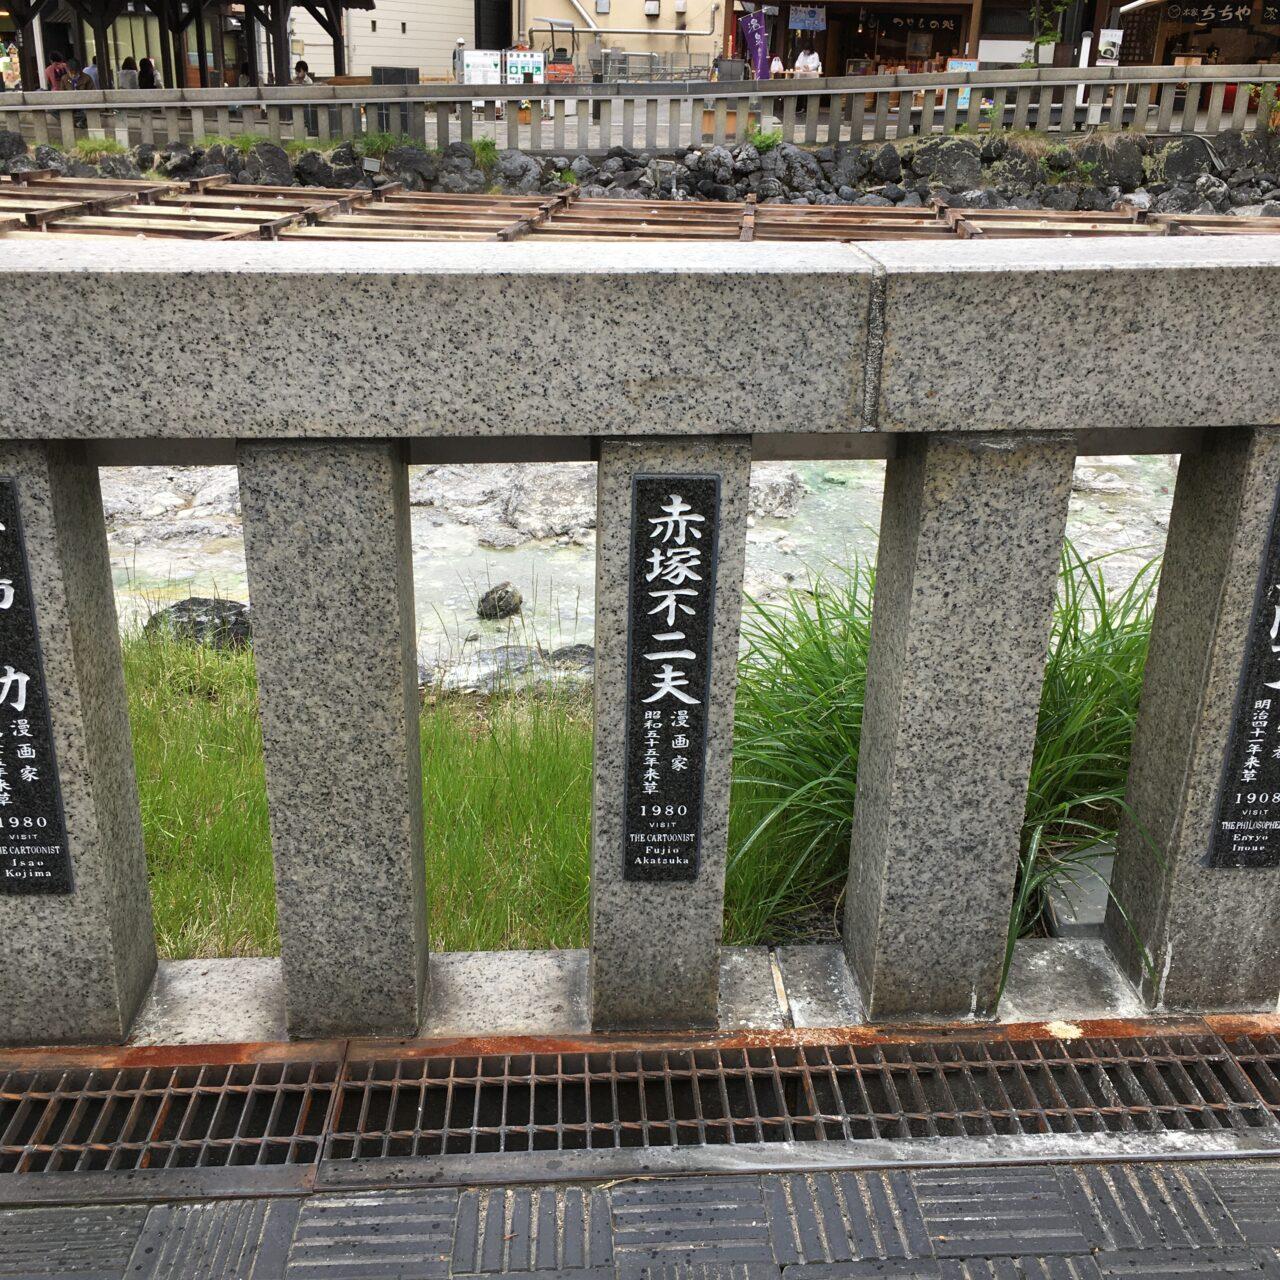 草津散歩と貸切温泉